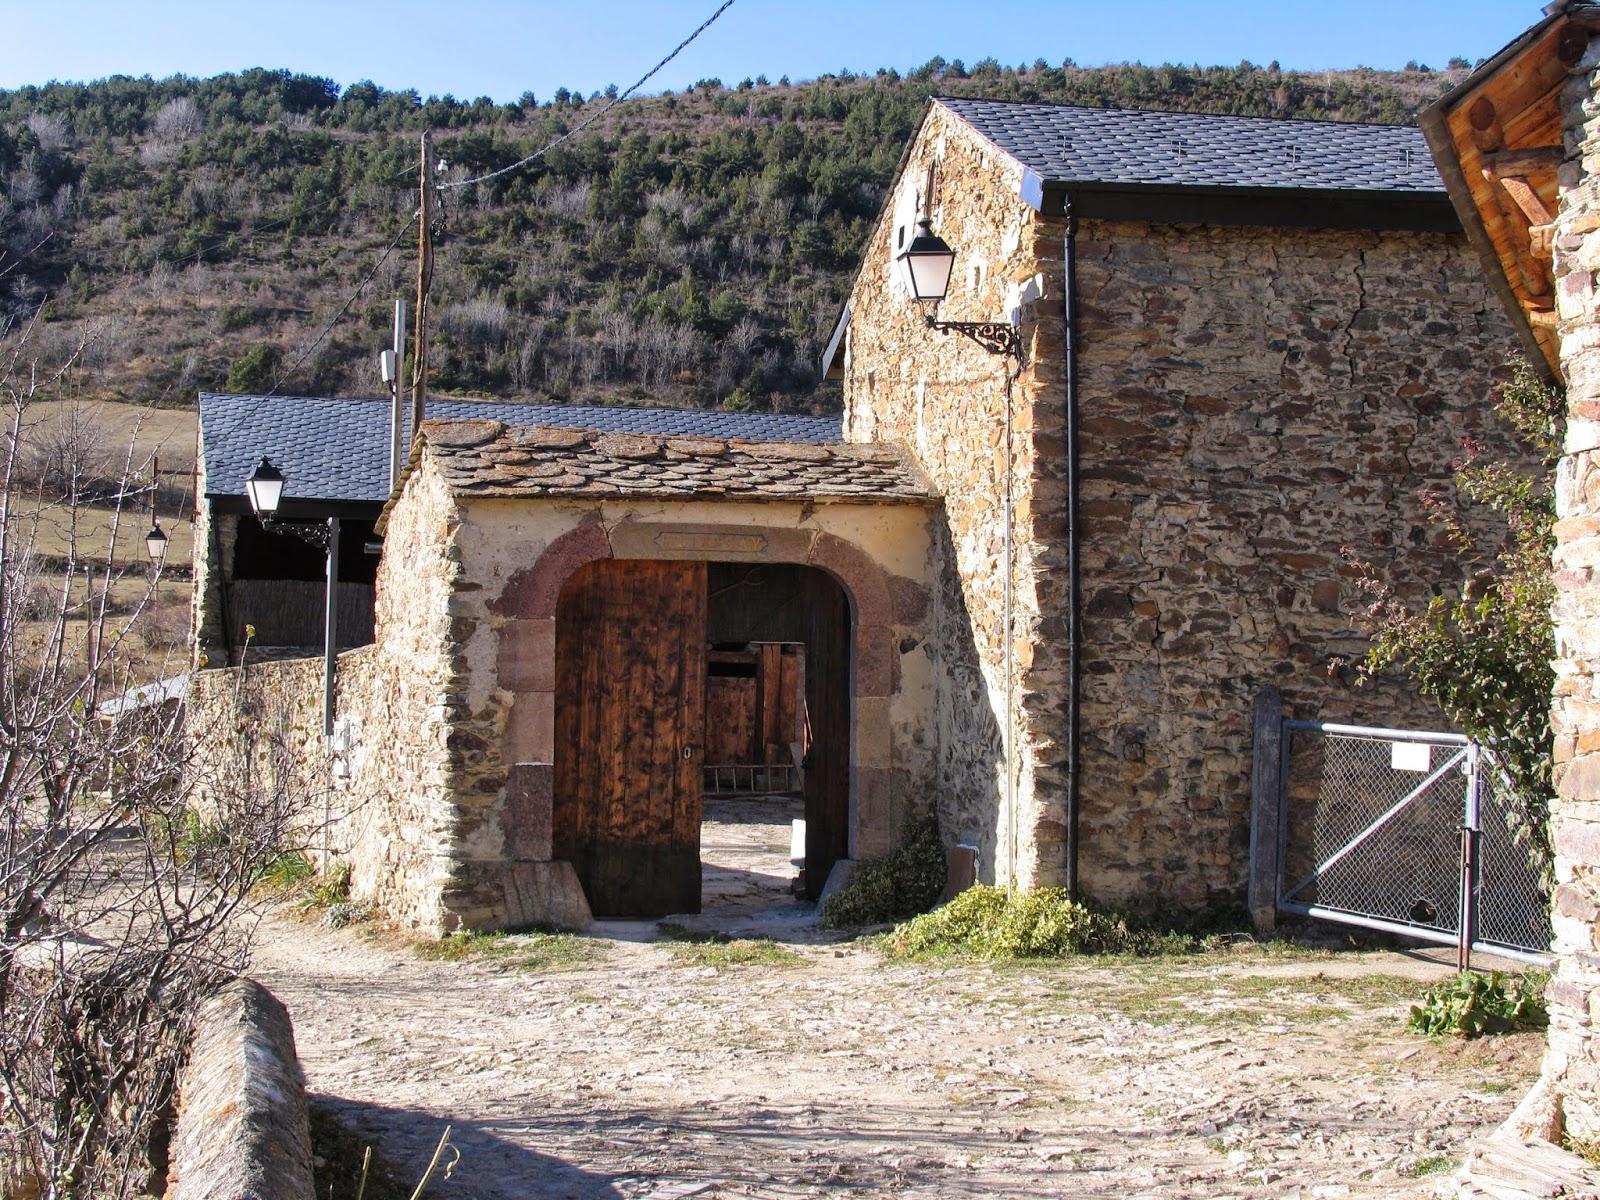 Ruralverd casa rural ller cerdanya 11501 for Casa rural catalunya piscina